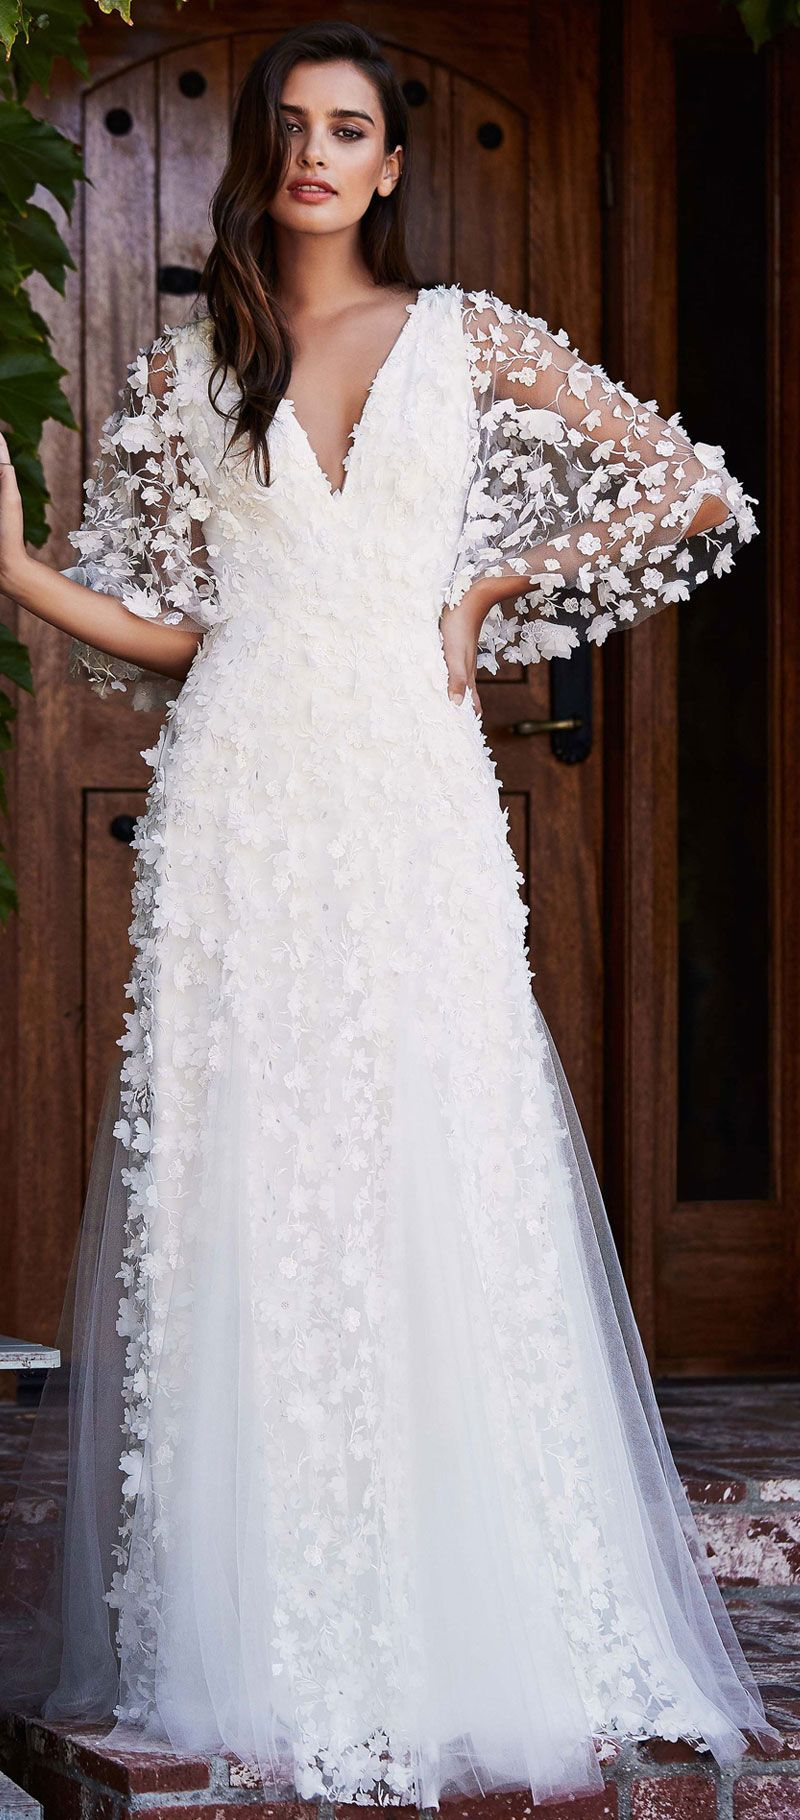 Tadashi Shoji Wedding.Tadashi Shoji Bridal Fall 2018 Wedding Dress Collection